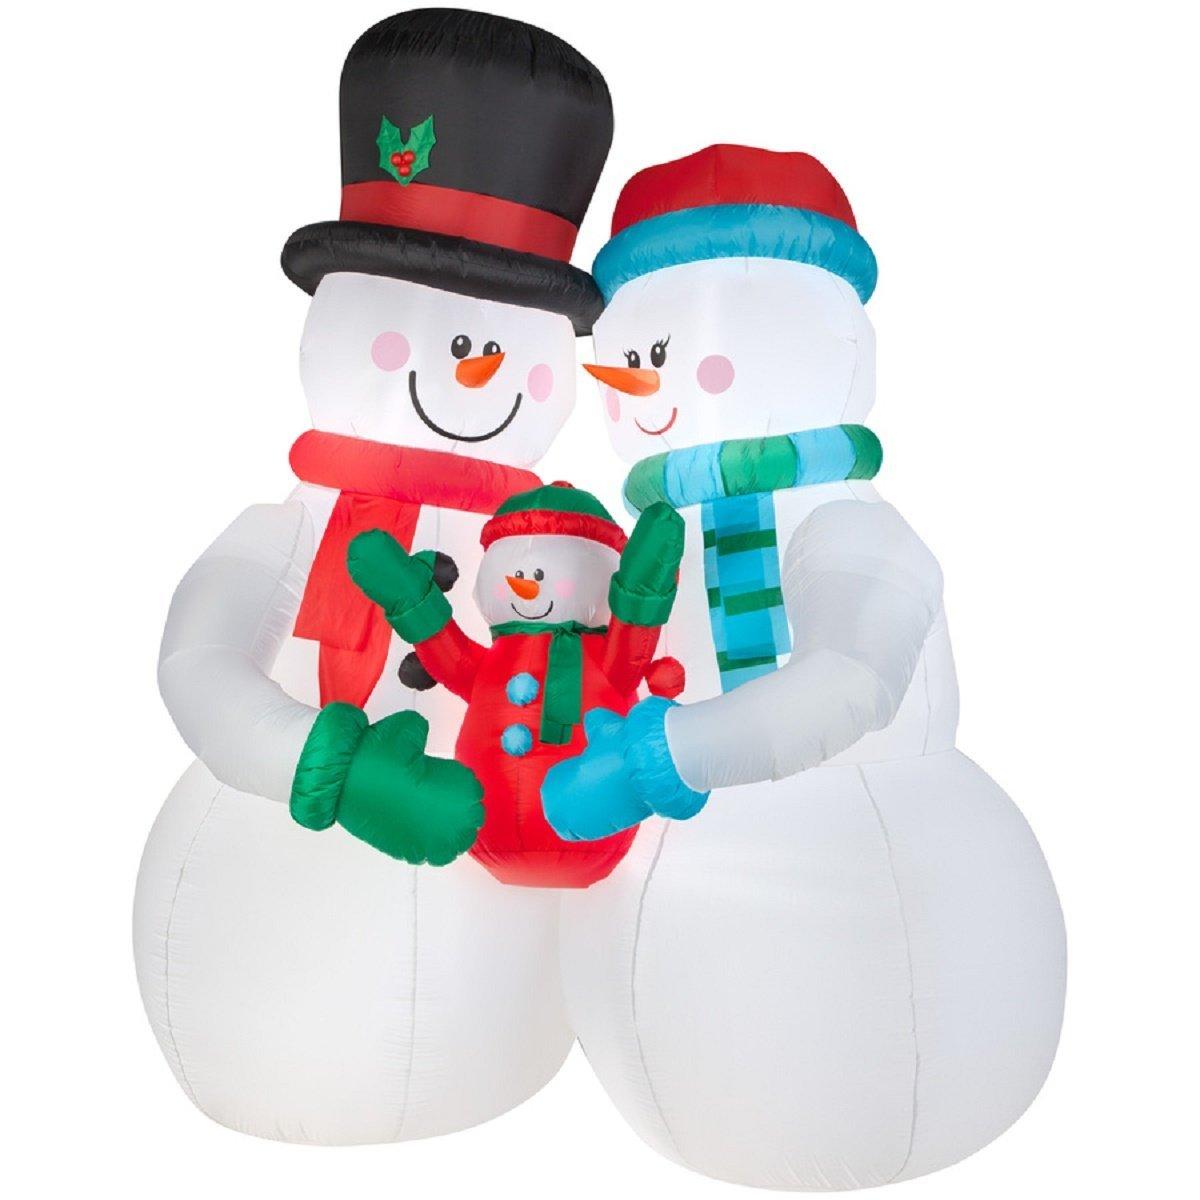 Cheap Gemmy Snowman, find Gemmy Snowman deals on line at Alibaba.com